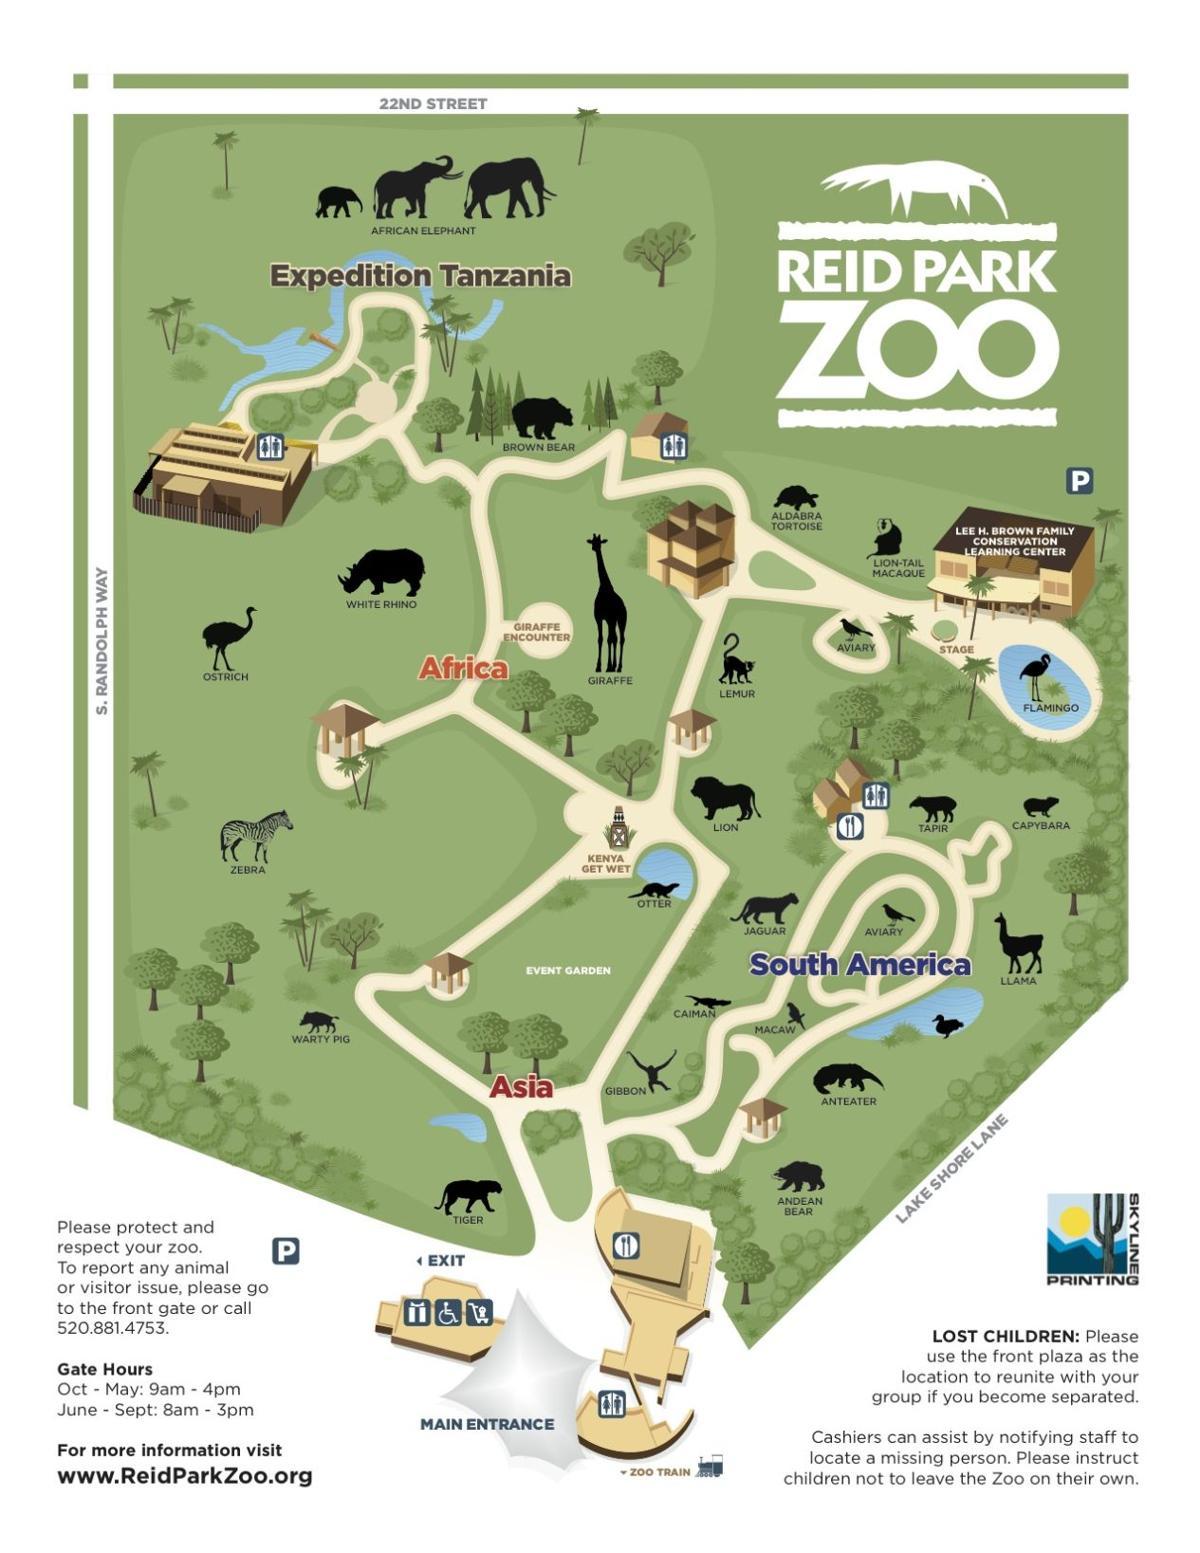 Reid Park Zoo map